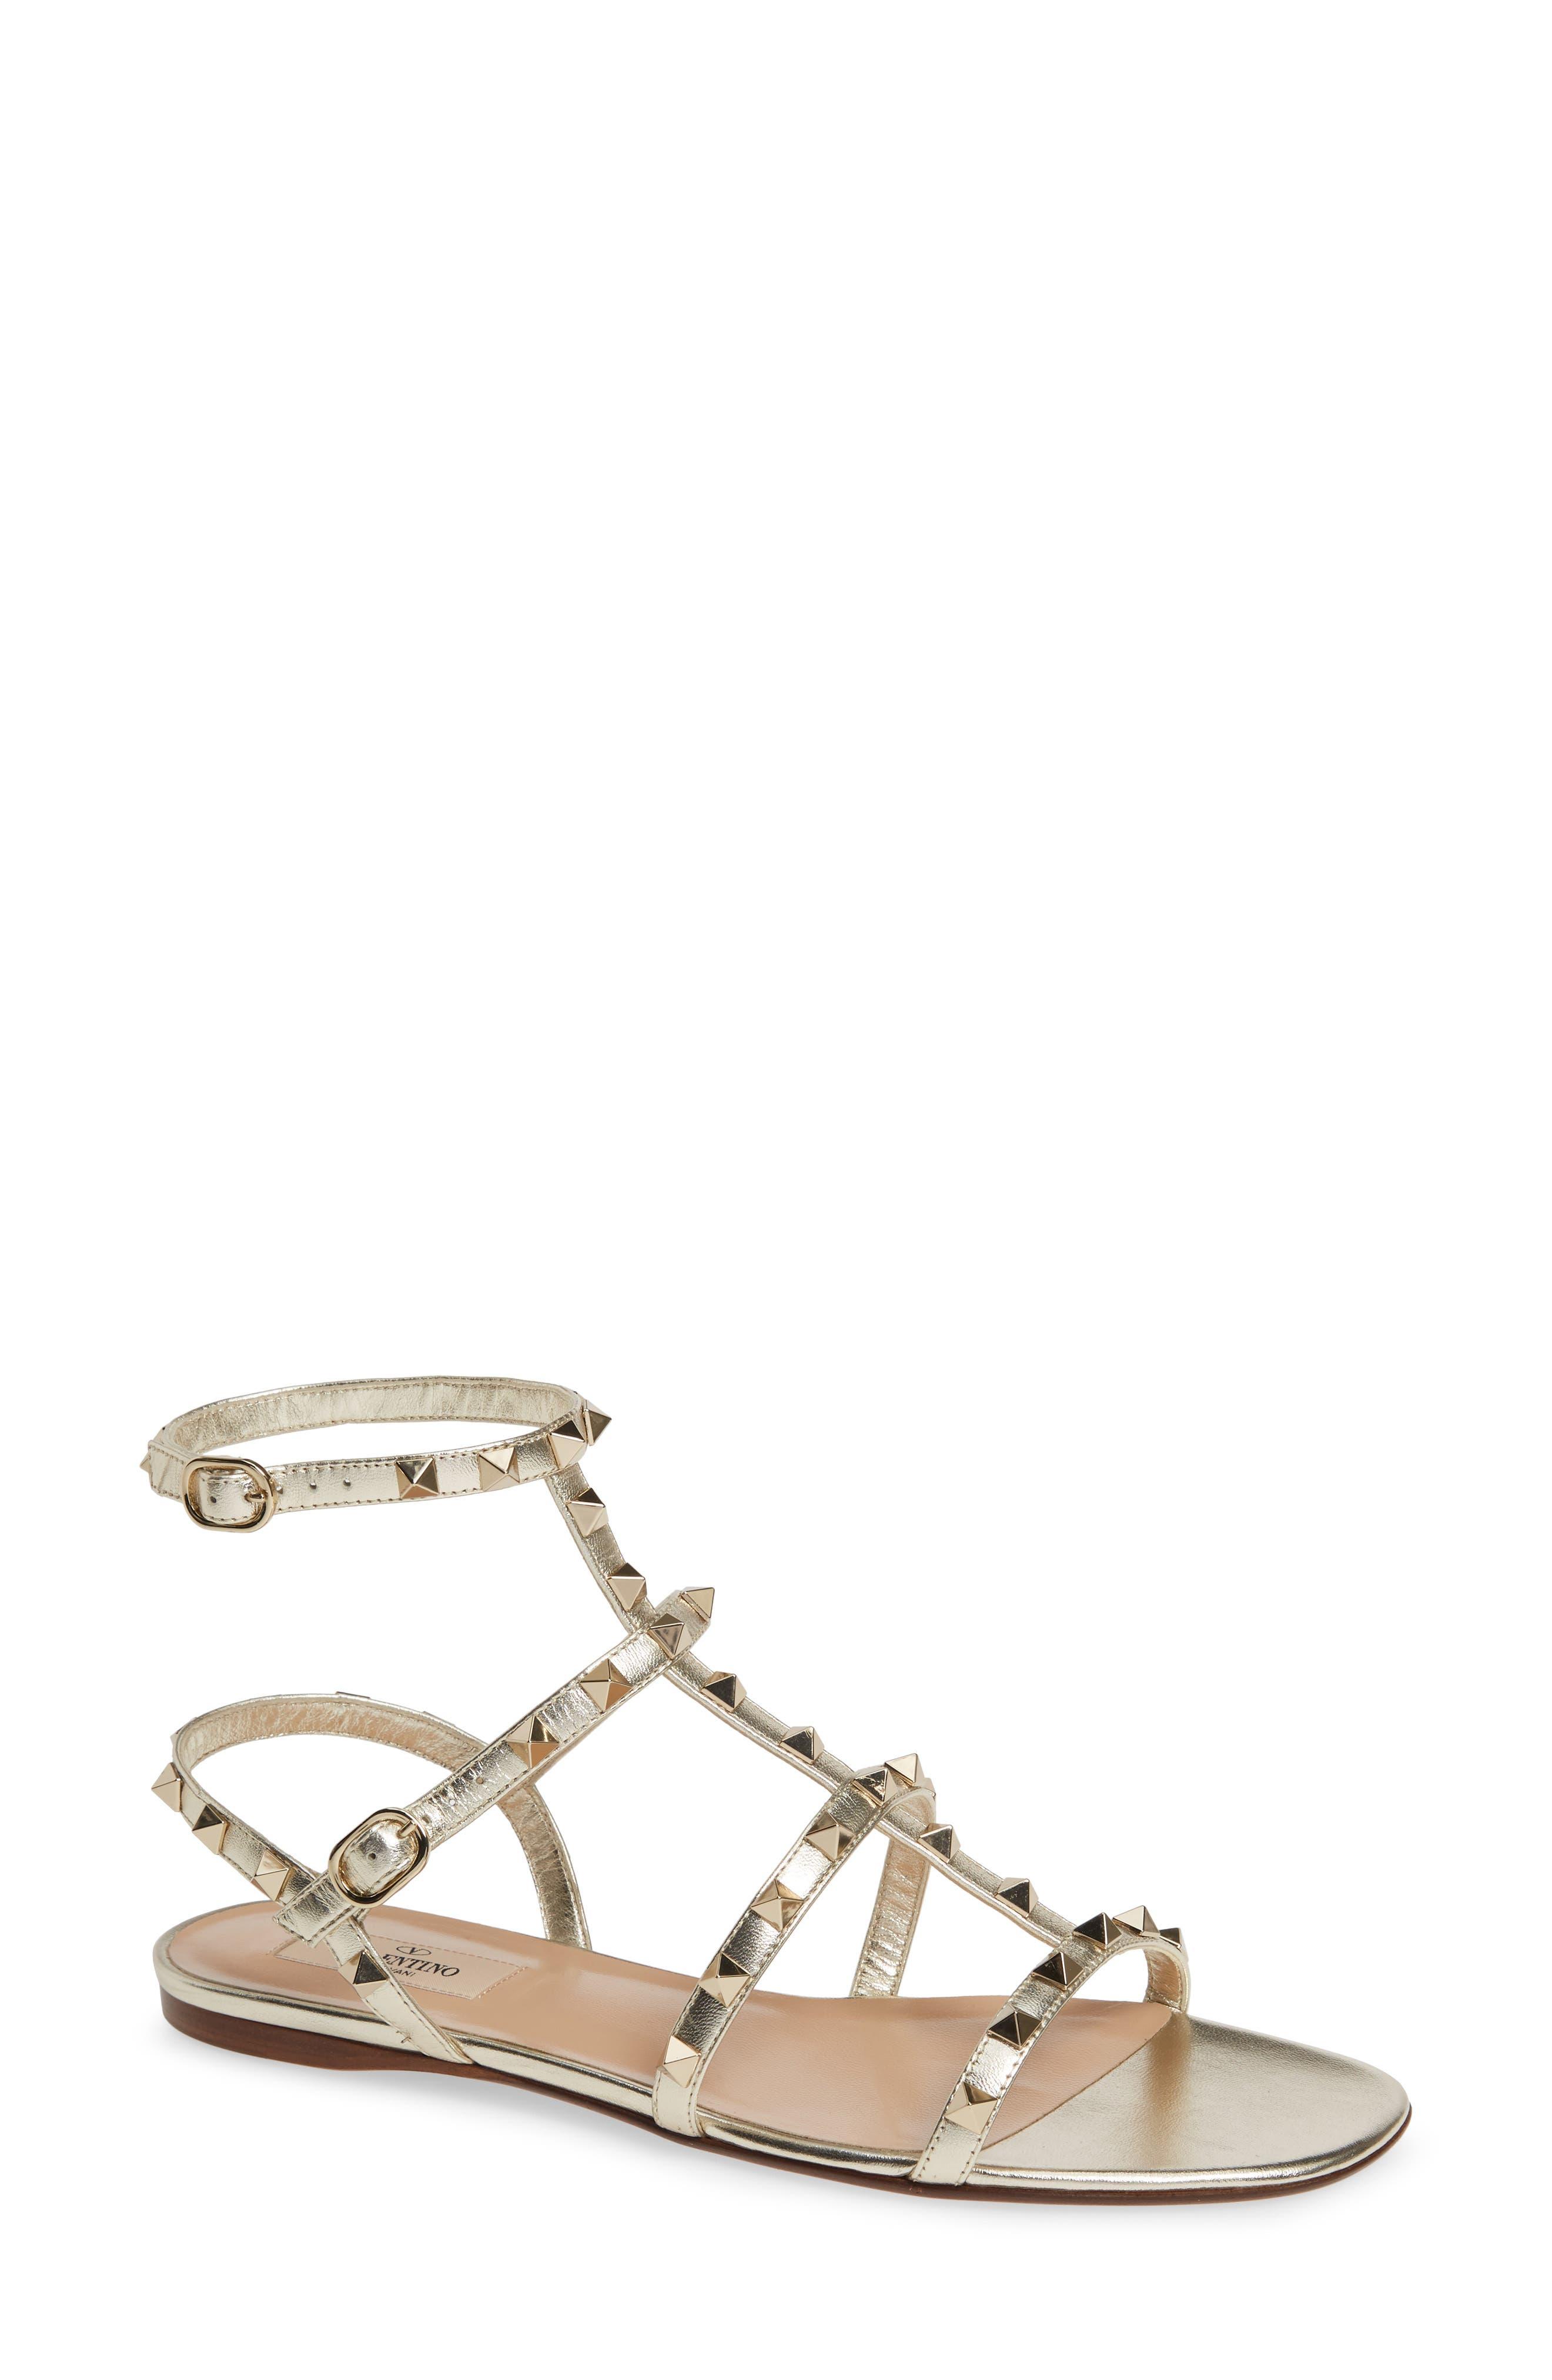 VALENTINO GARAVANI Rockstud Metallic Gladiator Sandal, Main, color, PLATINO